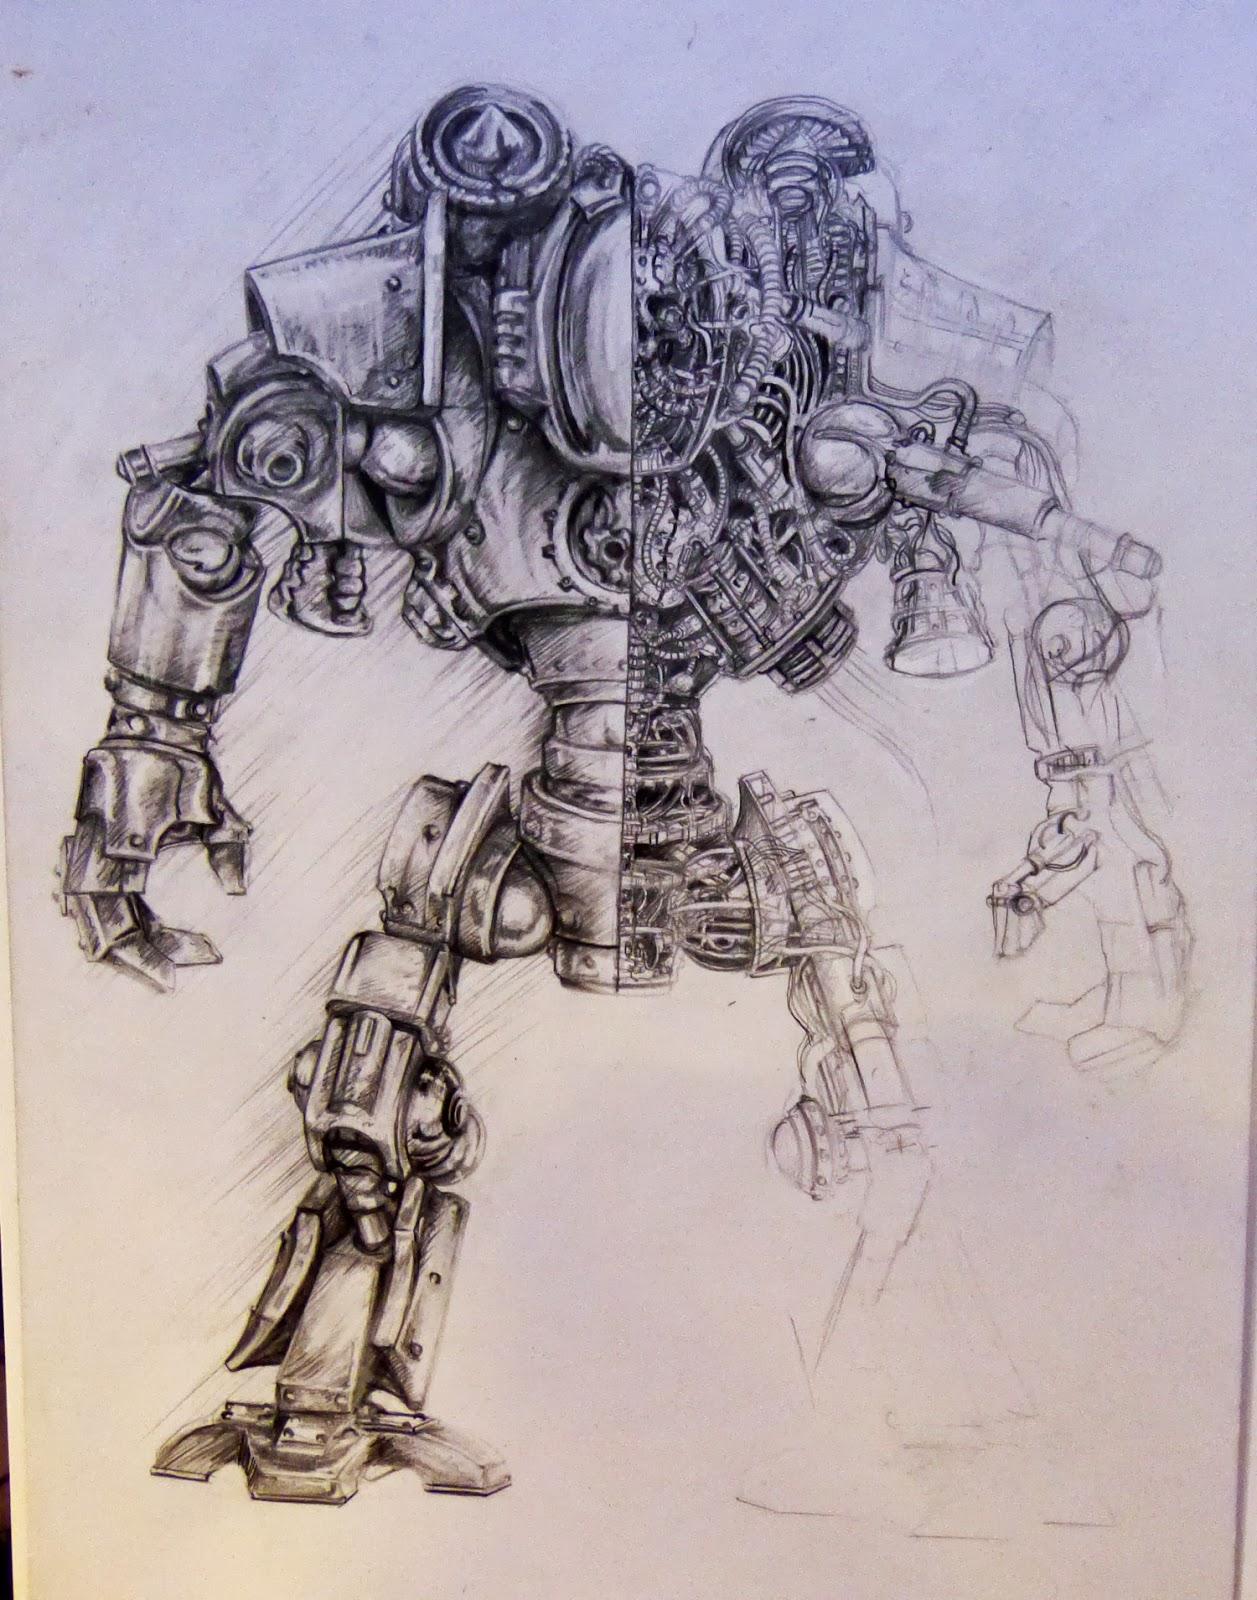 [W40K] Collection d'images : Adeptus Mechanicus P1050187